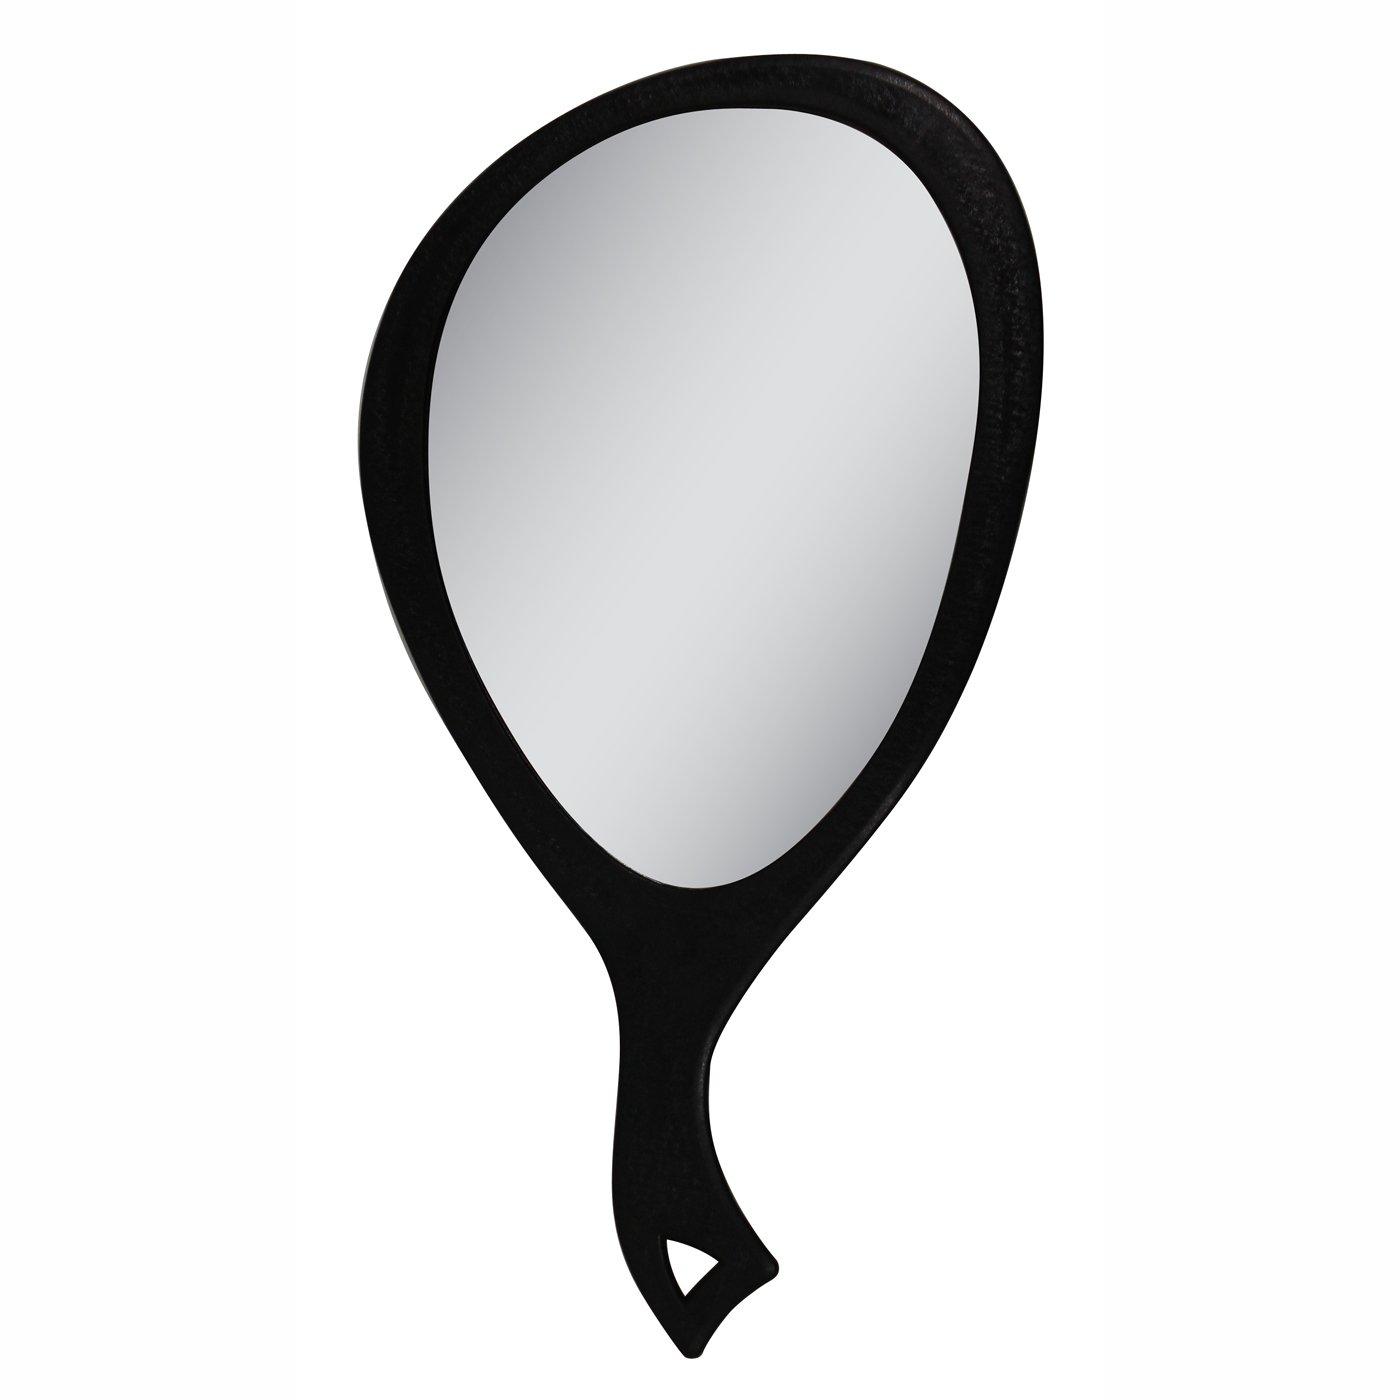 Hand mirror clipart 3